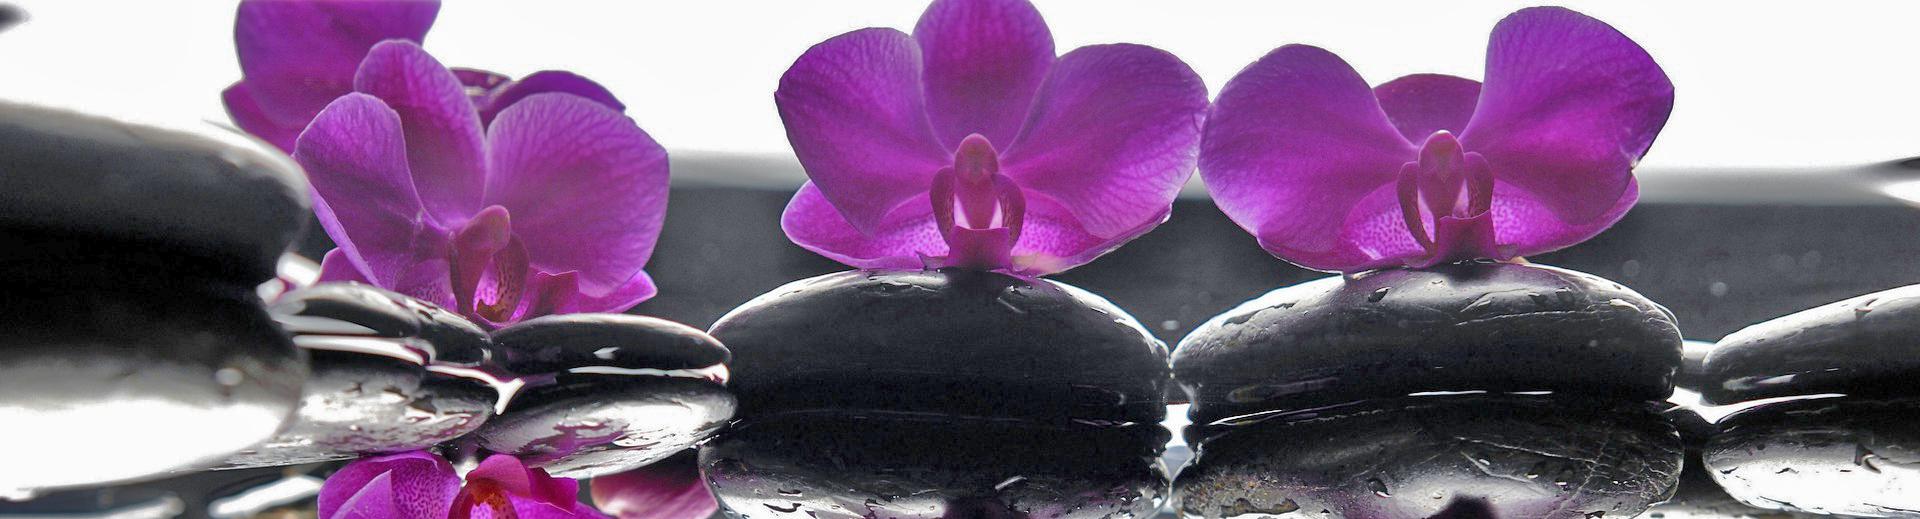 flores-spa